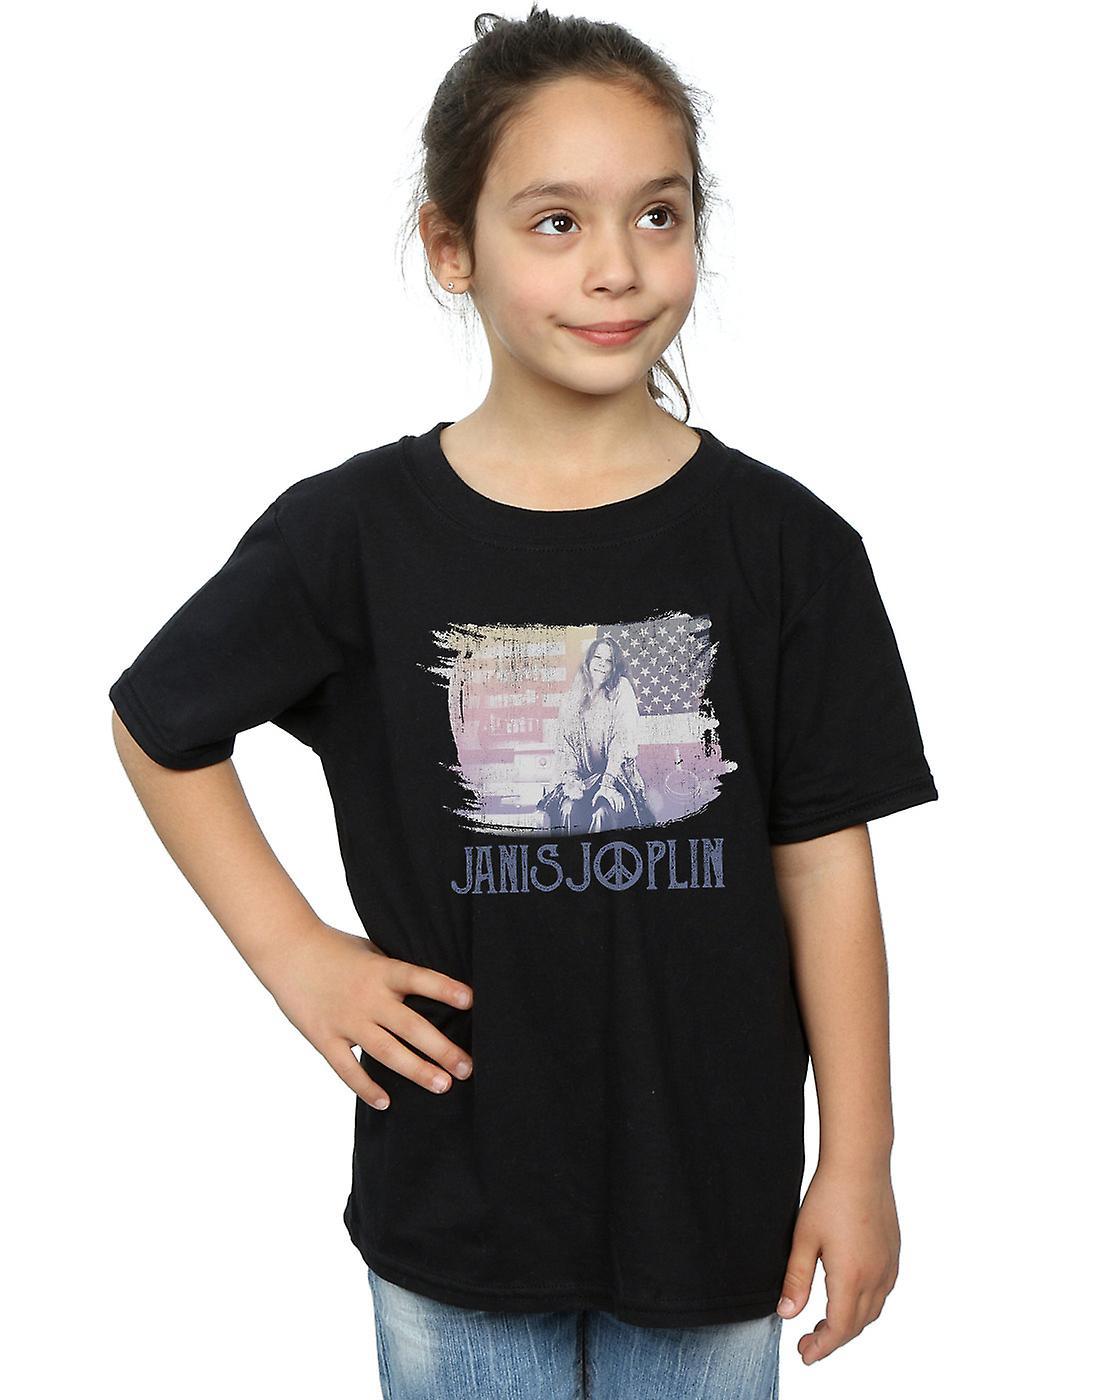 Janis Joplin Girls Stove Flag T-Shirt